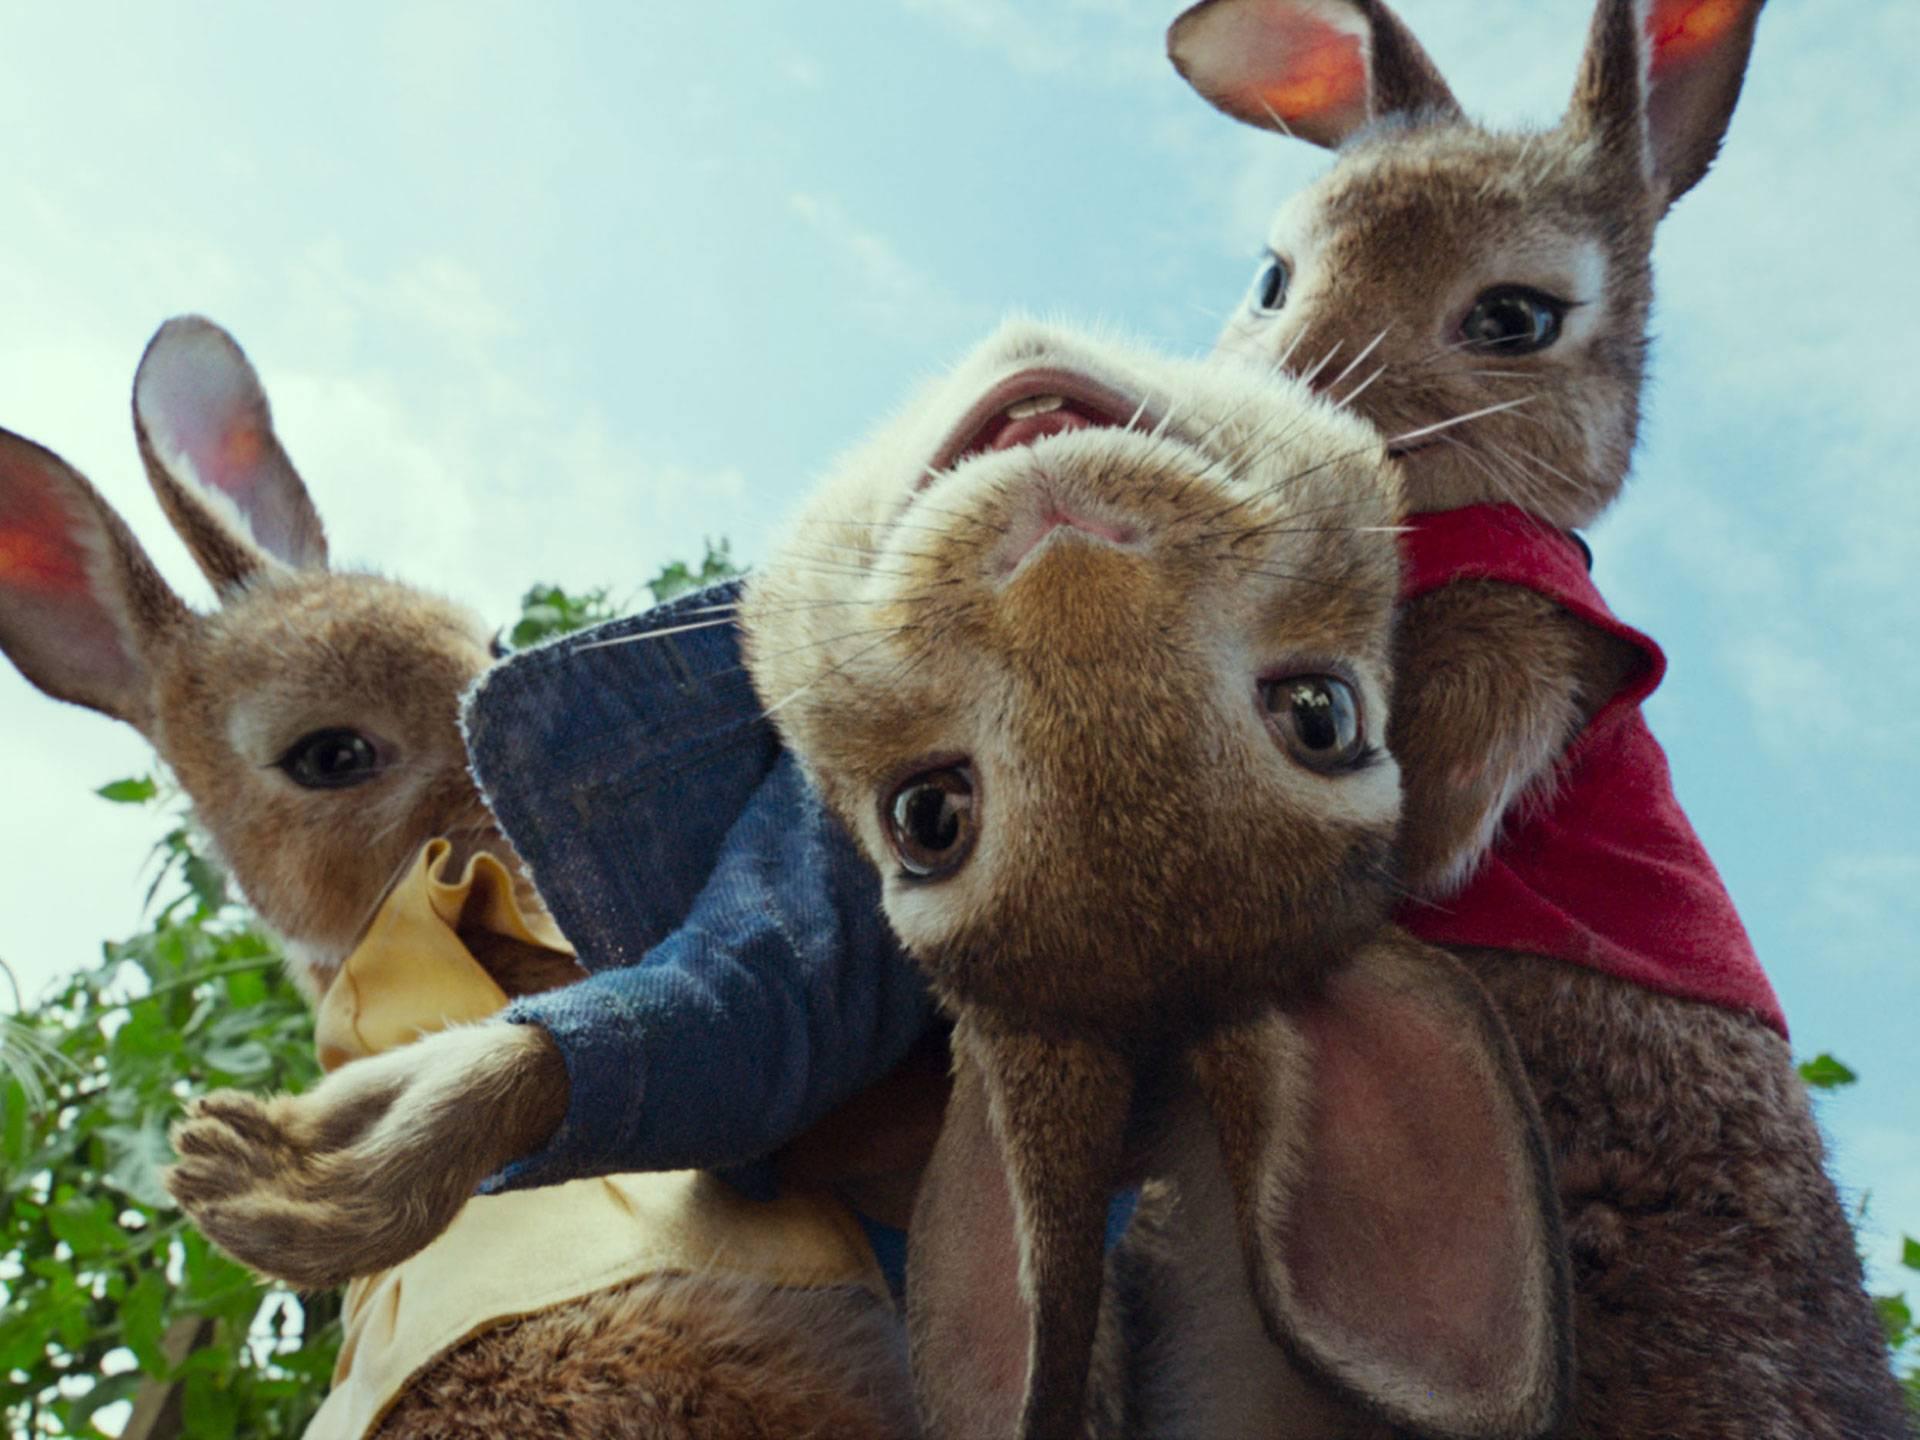 mgid:file:gsp:scenic:/international/nick-intl/images/series/orange-carpet/ep-24-peter-rabbit/peter-rabbit-04.jpg